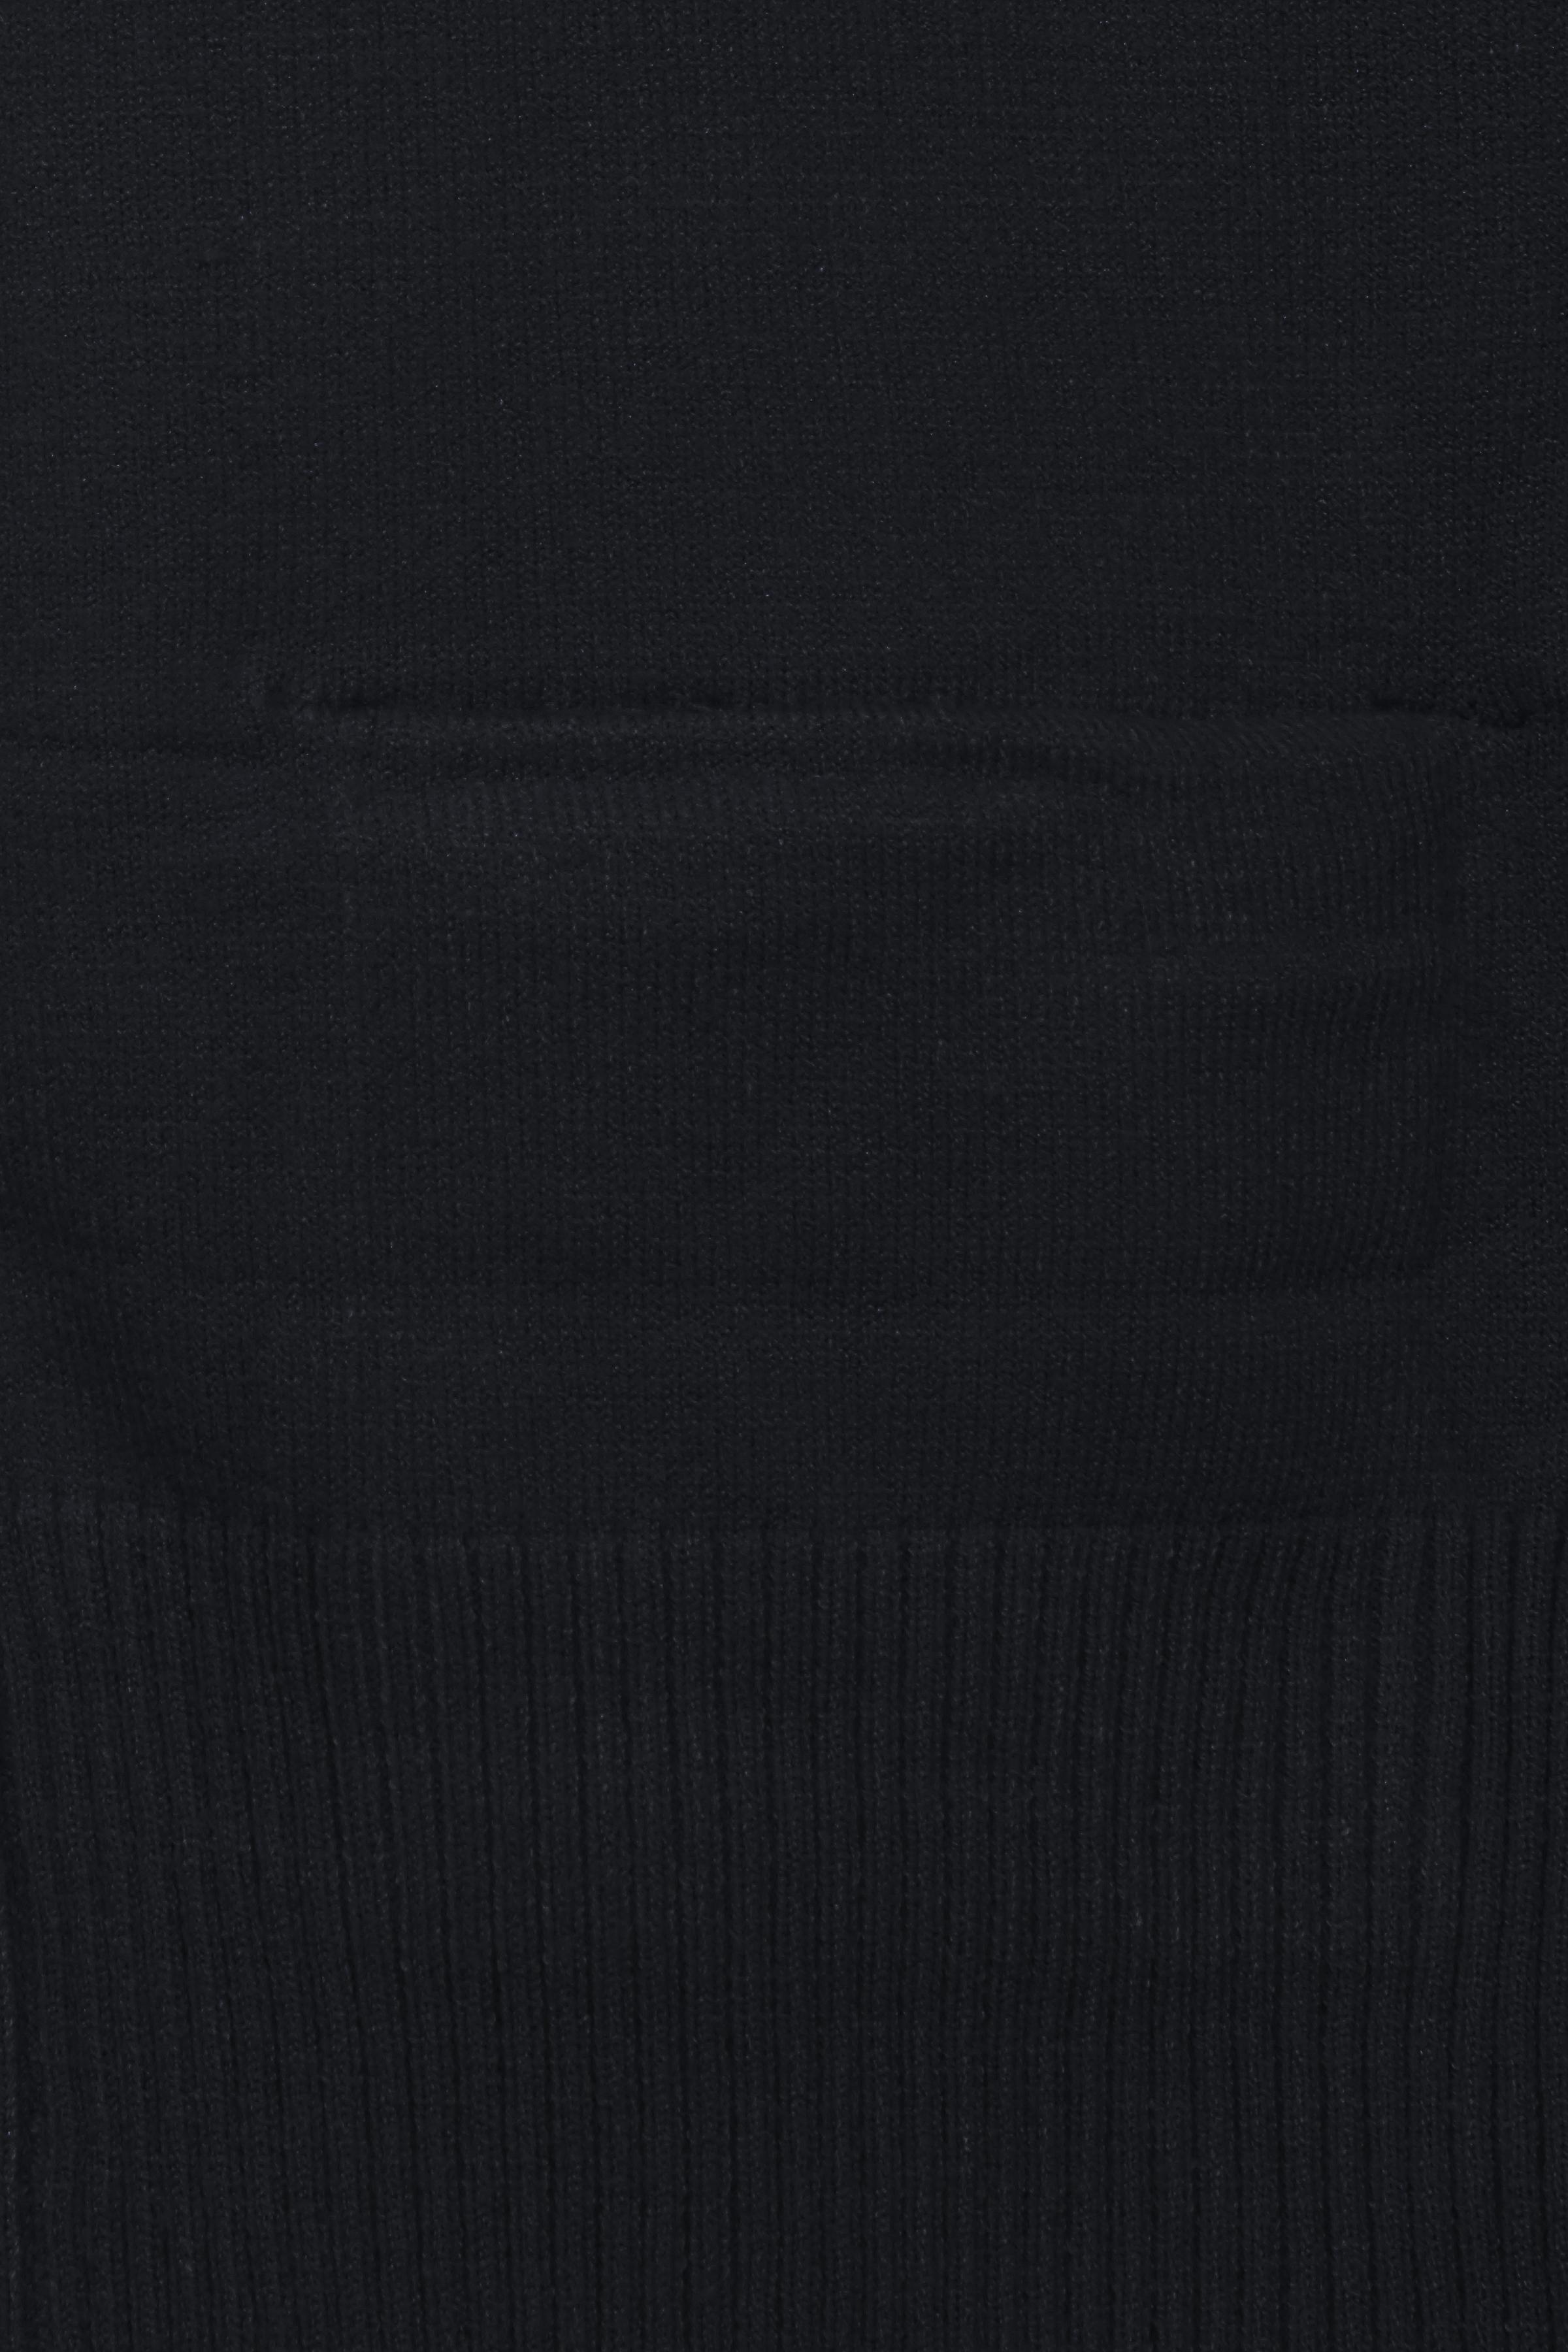 MEL. Copenhagen Night Knitted cardigan from b.young – Buy MEL. Copenhagen Night Knitted cardigan from size XS-XXL here